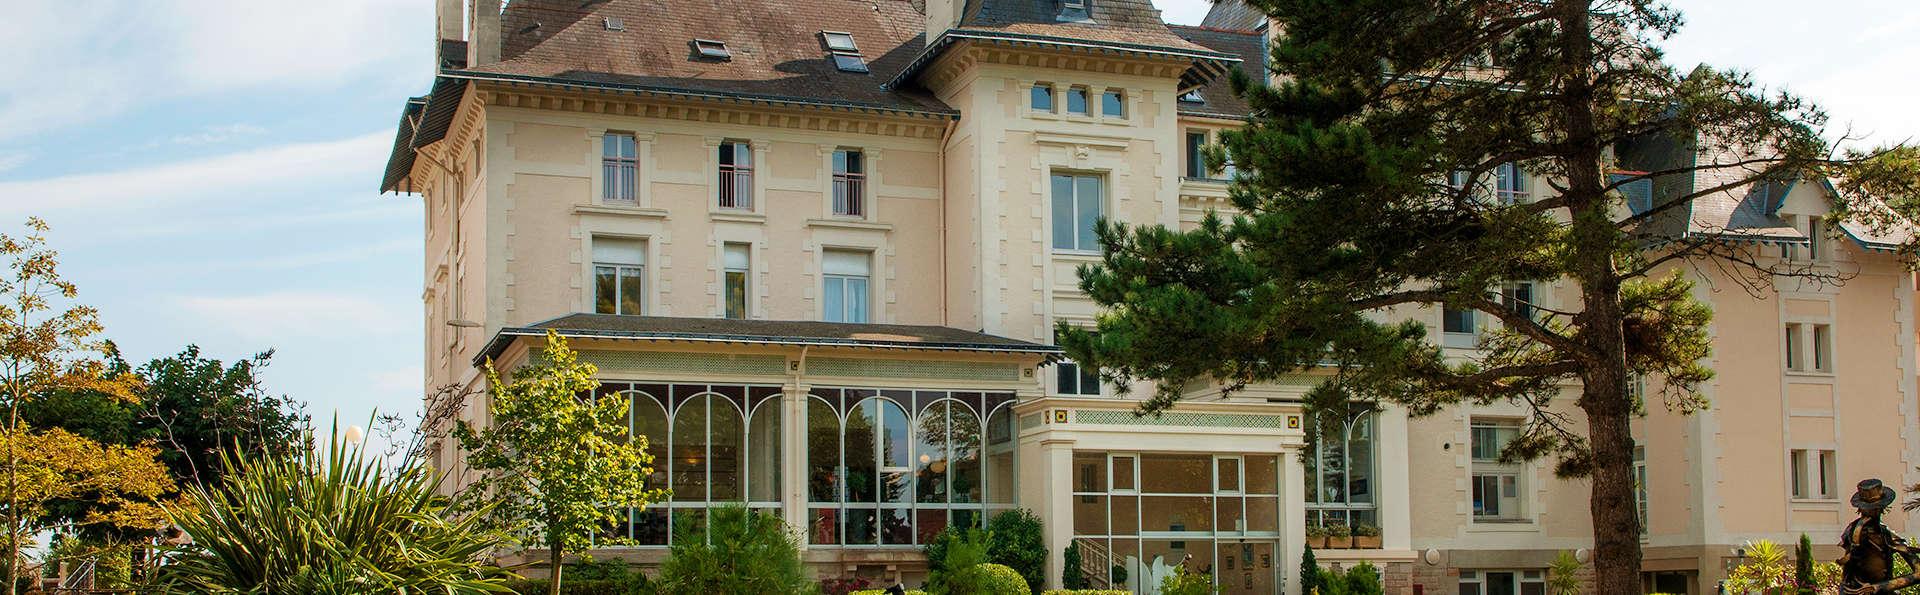 Hôtel Vacances Bleues Villa Caroline - EDIT_Fachada_3.jpg